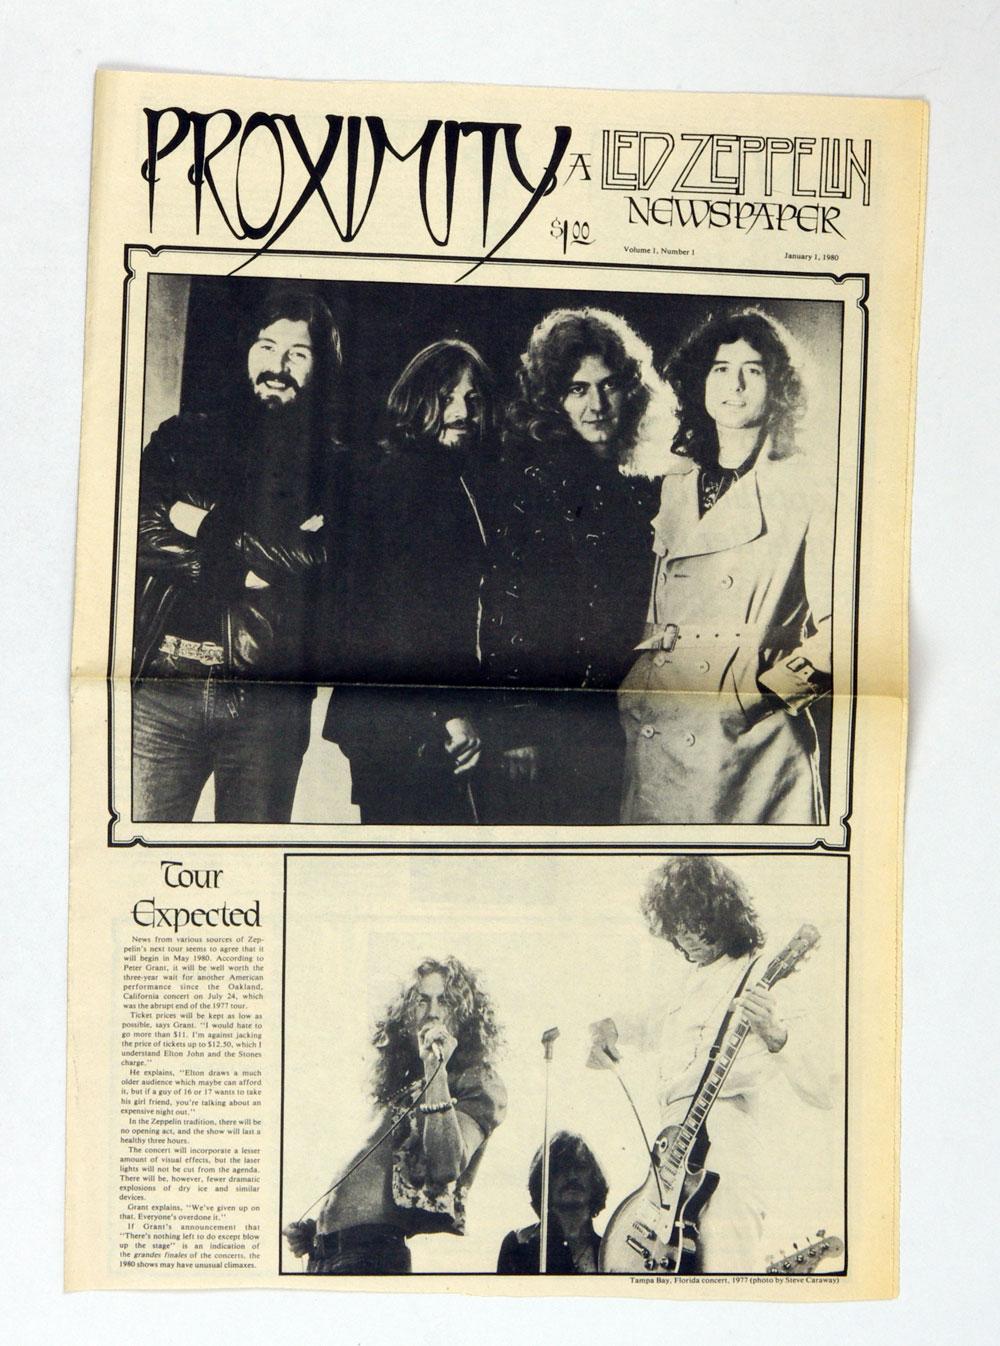 Led Zeppelin Fanzine Proximity Vol. 1 thru Vol 8 Complete Set 1980 thru 1981